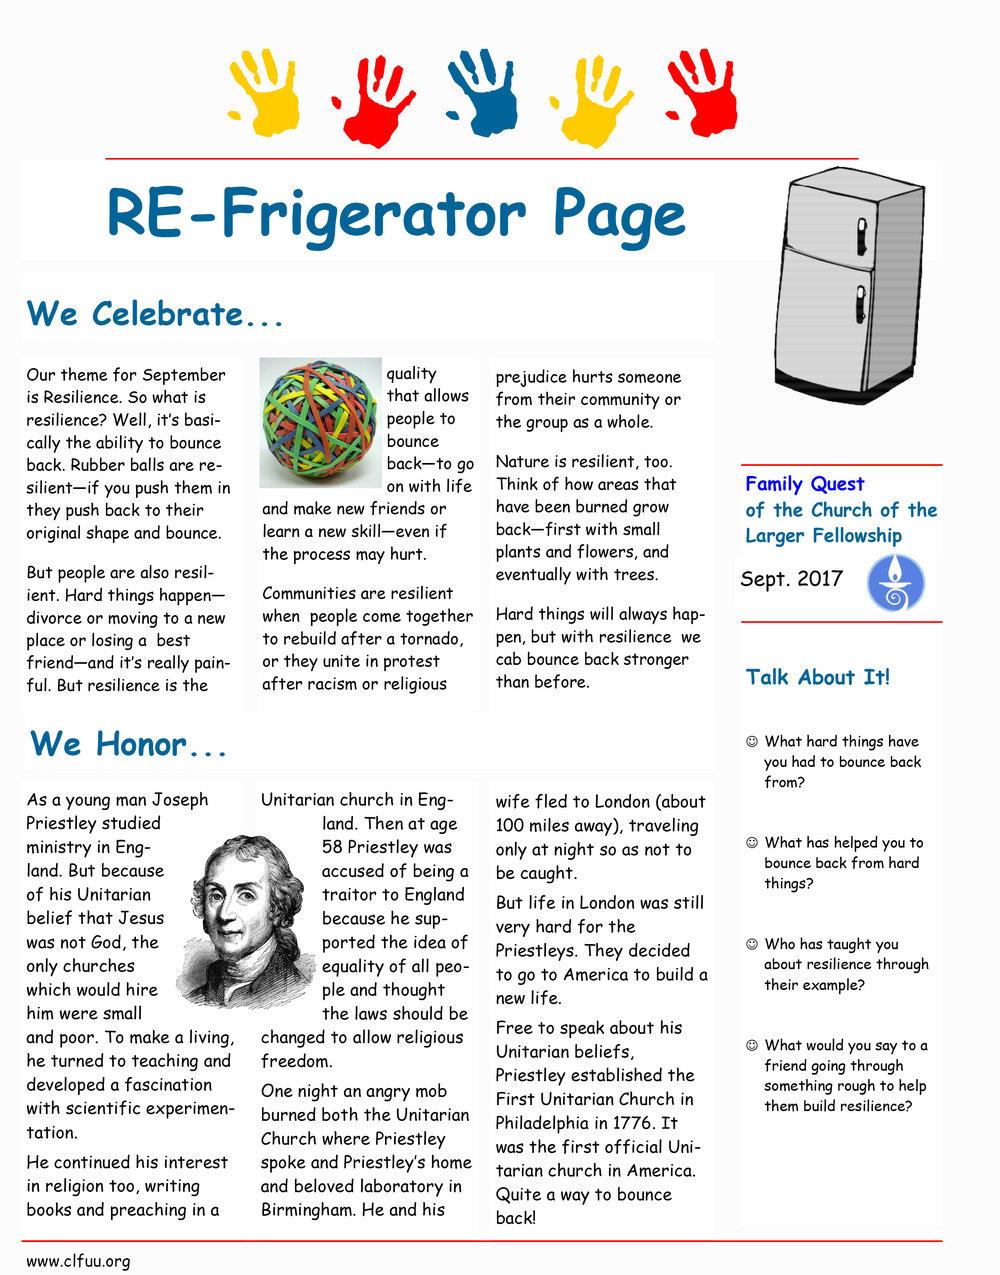 REFrigerator Page 9-17